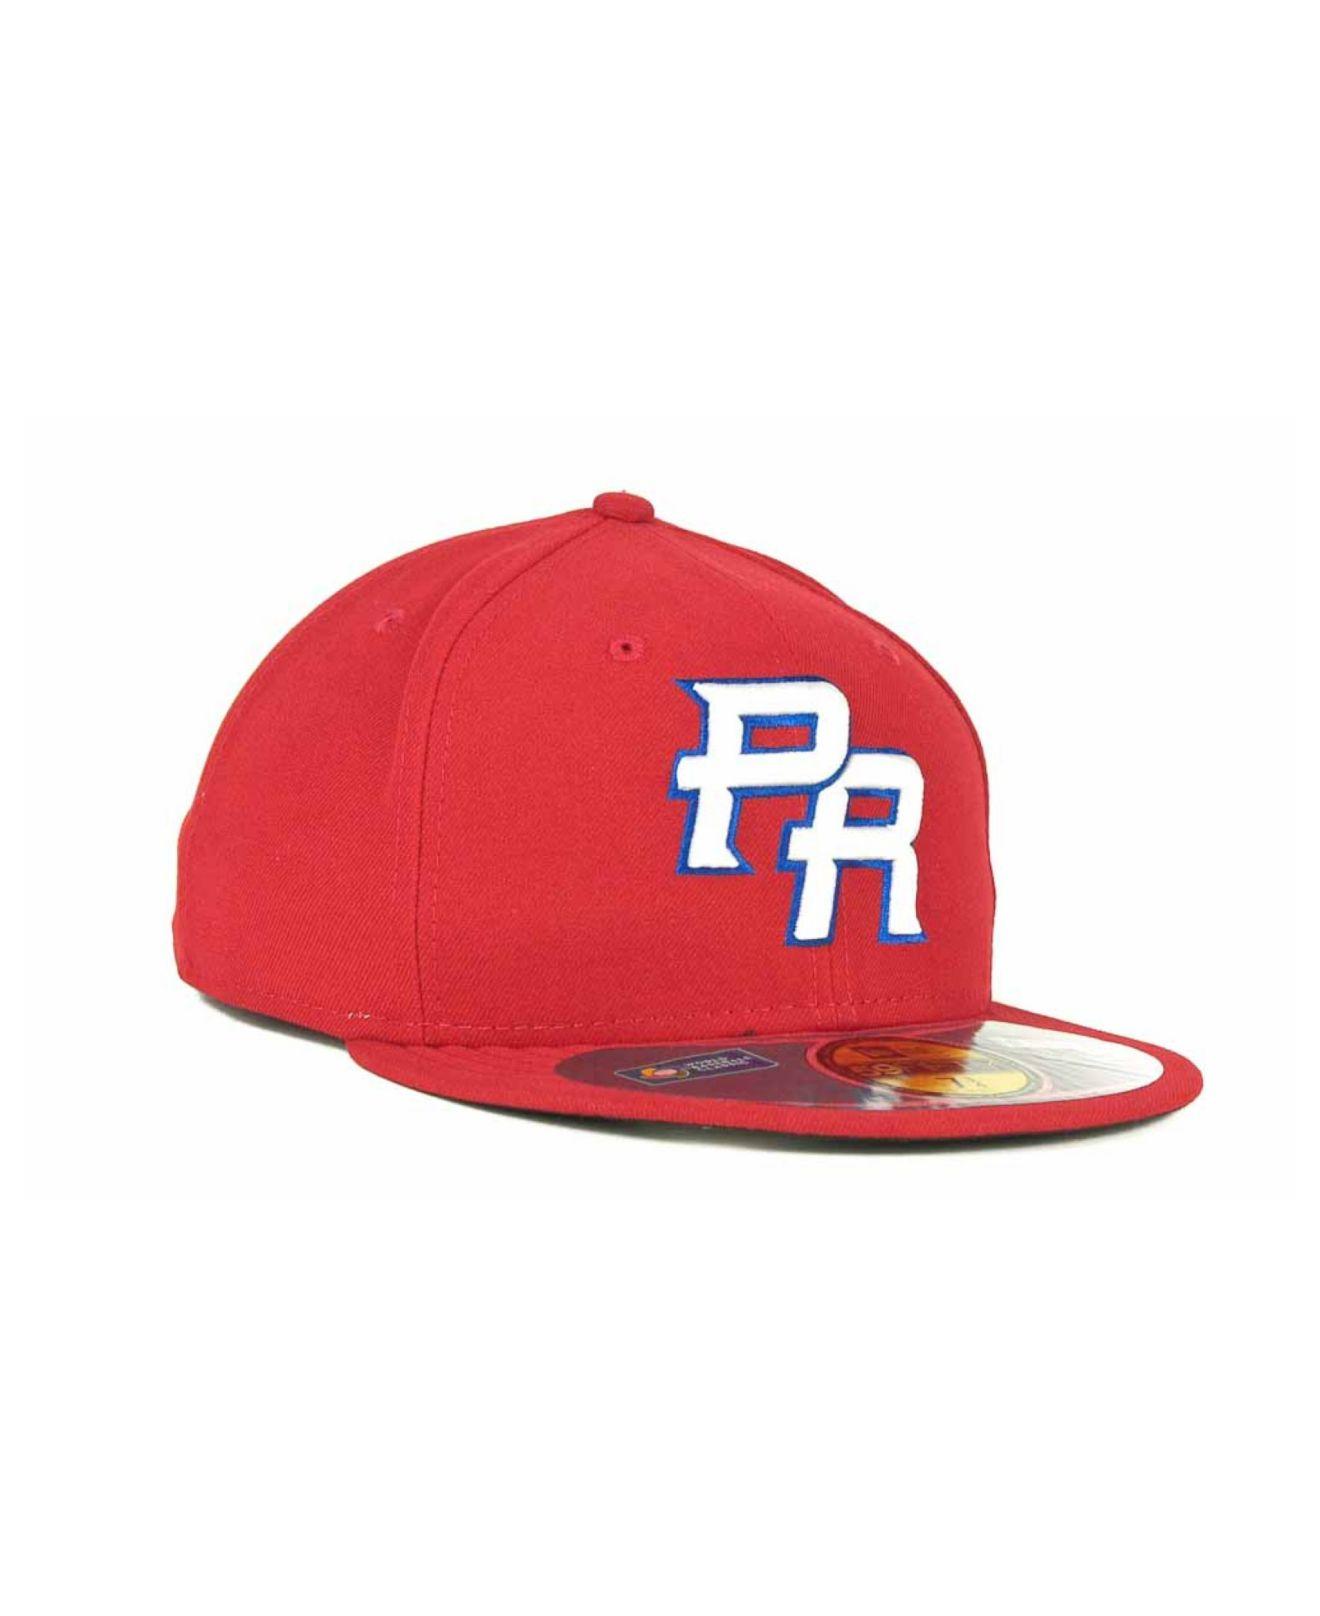 ... sweden lyst ktz puerto rico 2013 world baseball classic 59fifty cap in  6831a 09ea0 aa85412f8b59